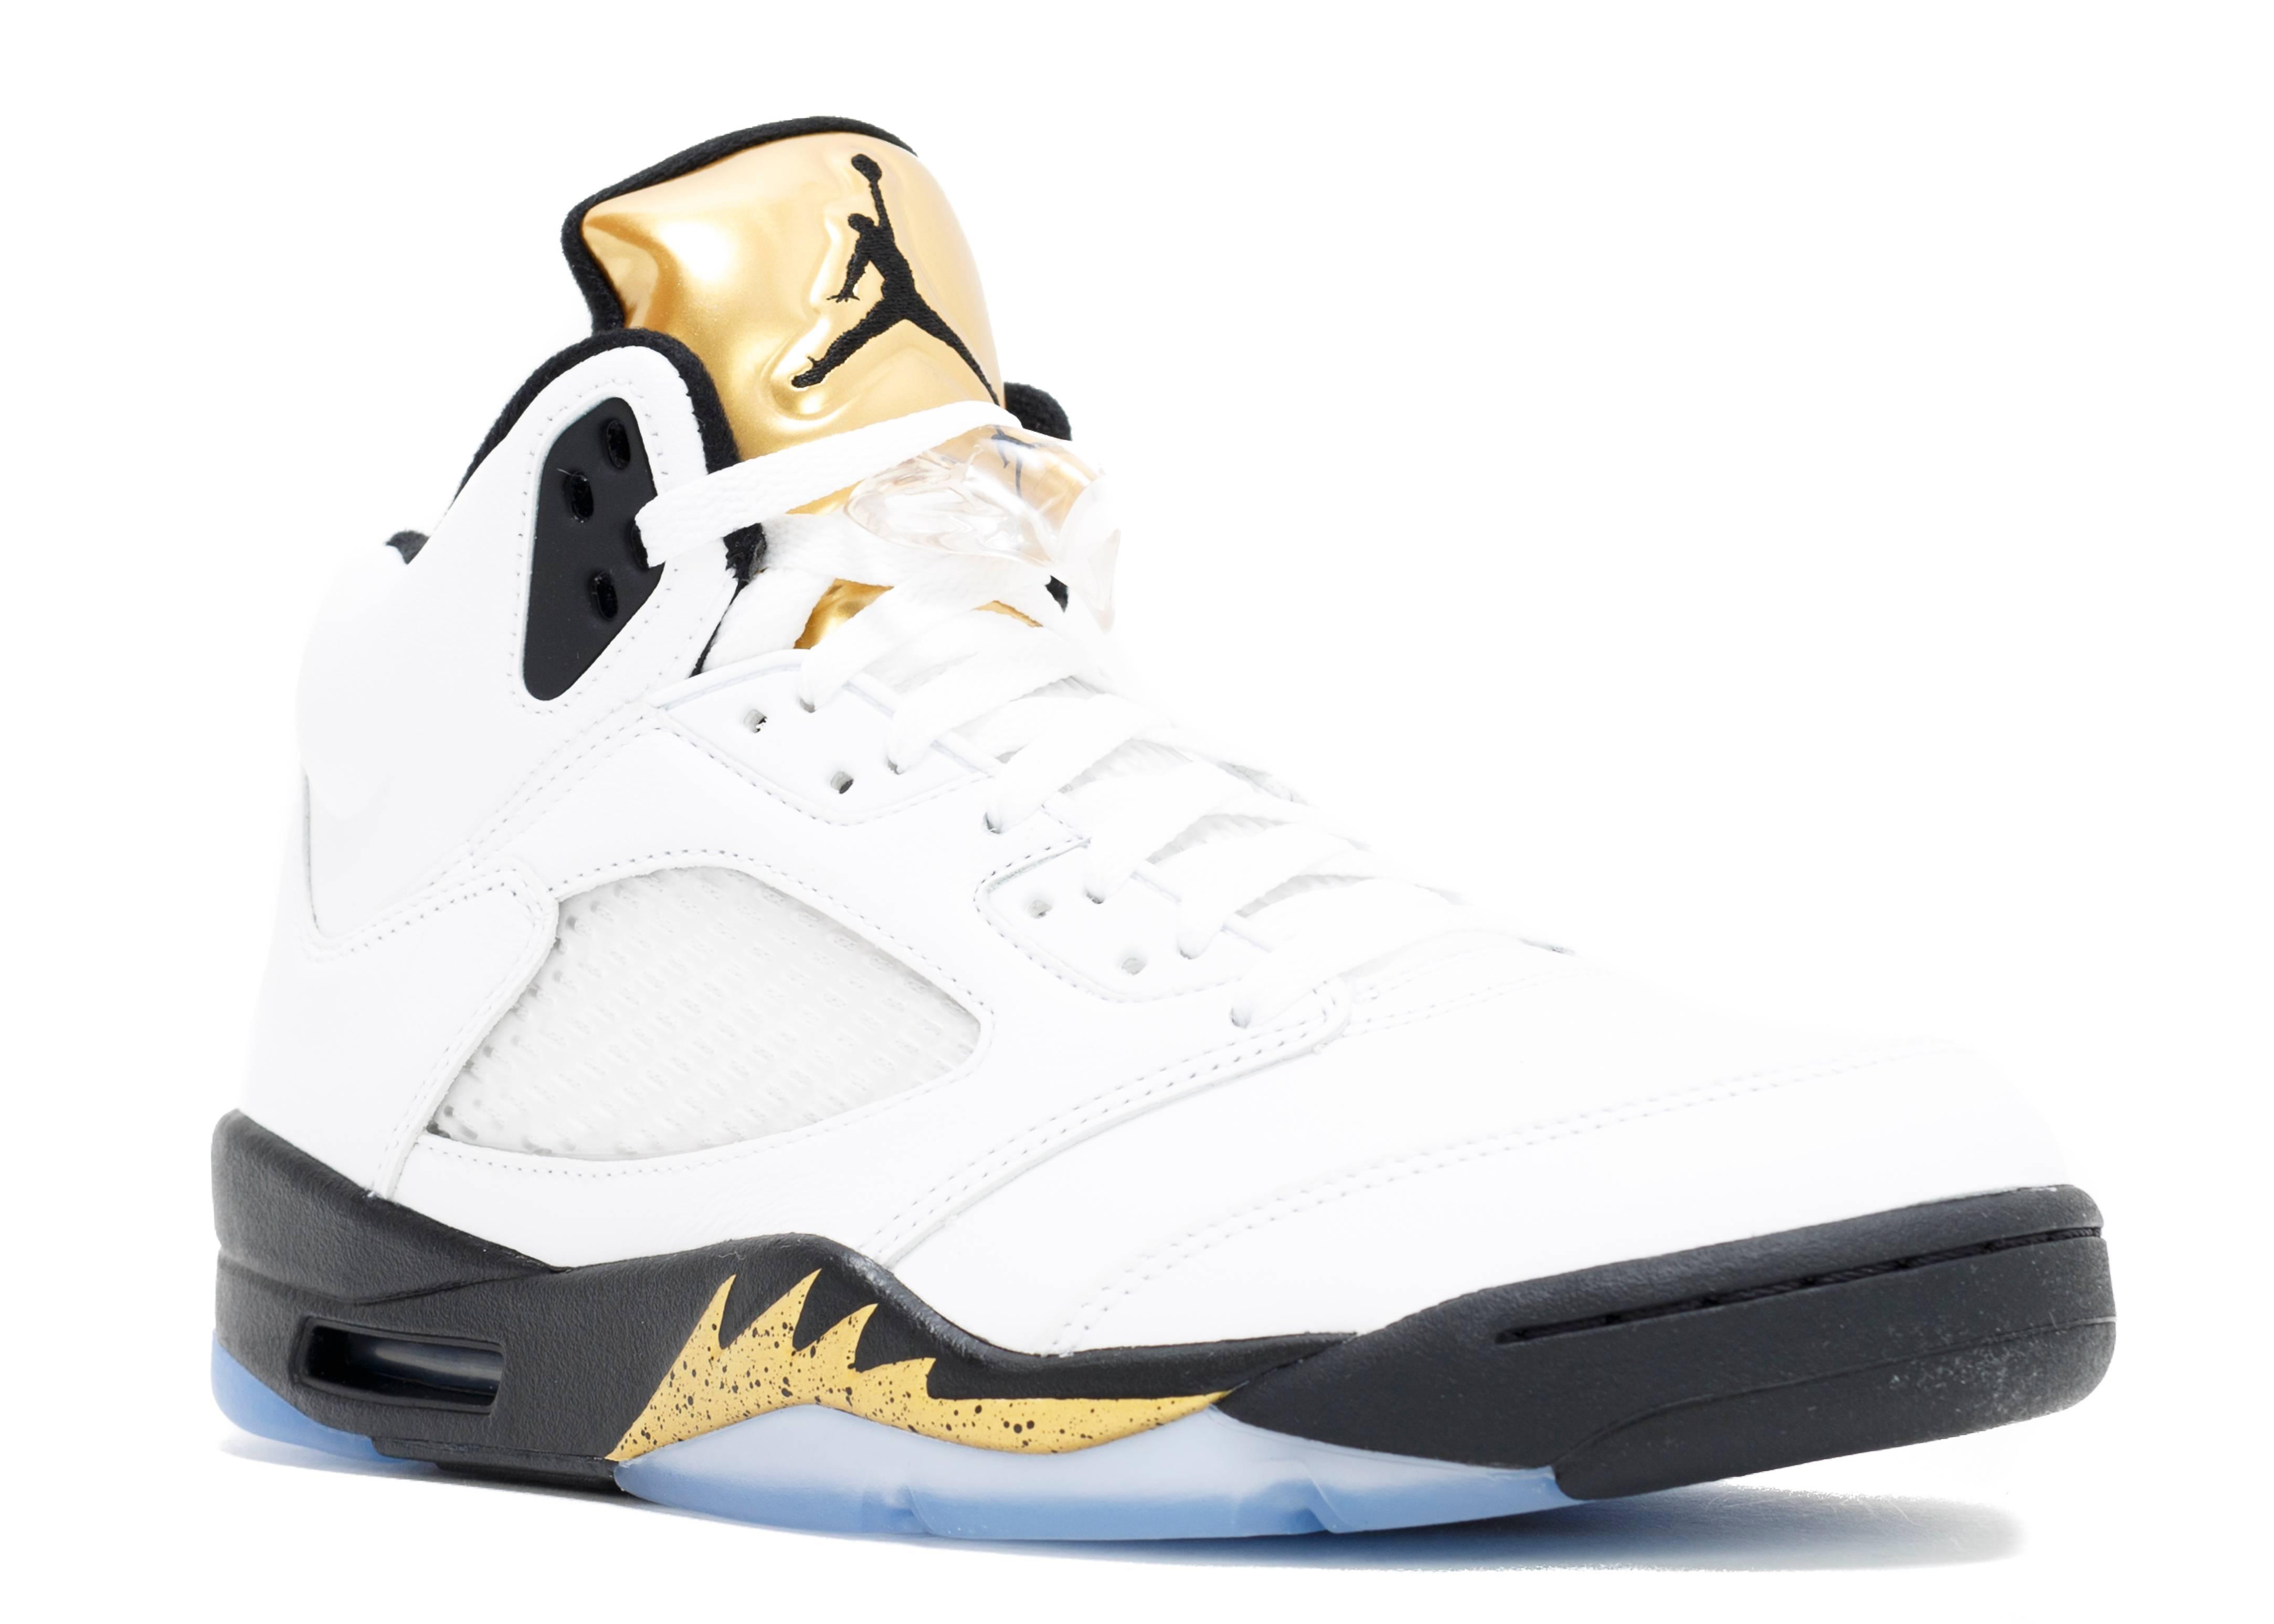 sports shoes 091d3 6e128 ... metallic gold celebrating the 2016 olympic hot air jordan 5 retro  olympic fffa2 39fb8 ...